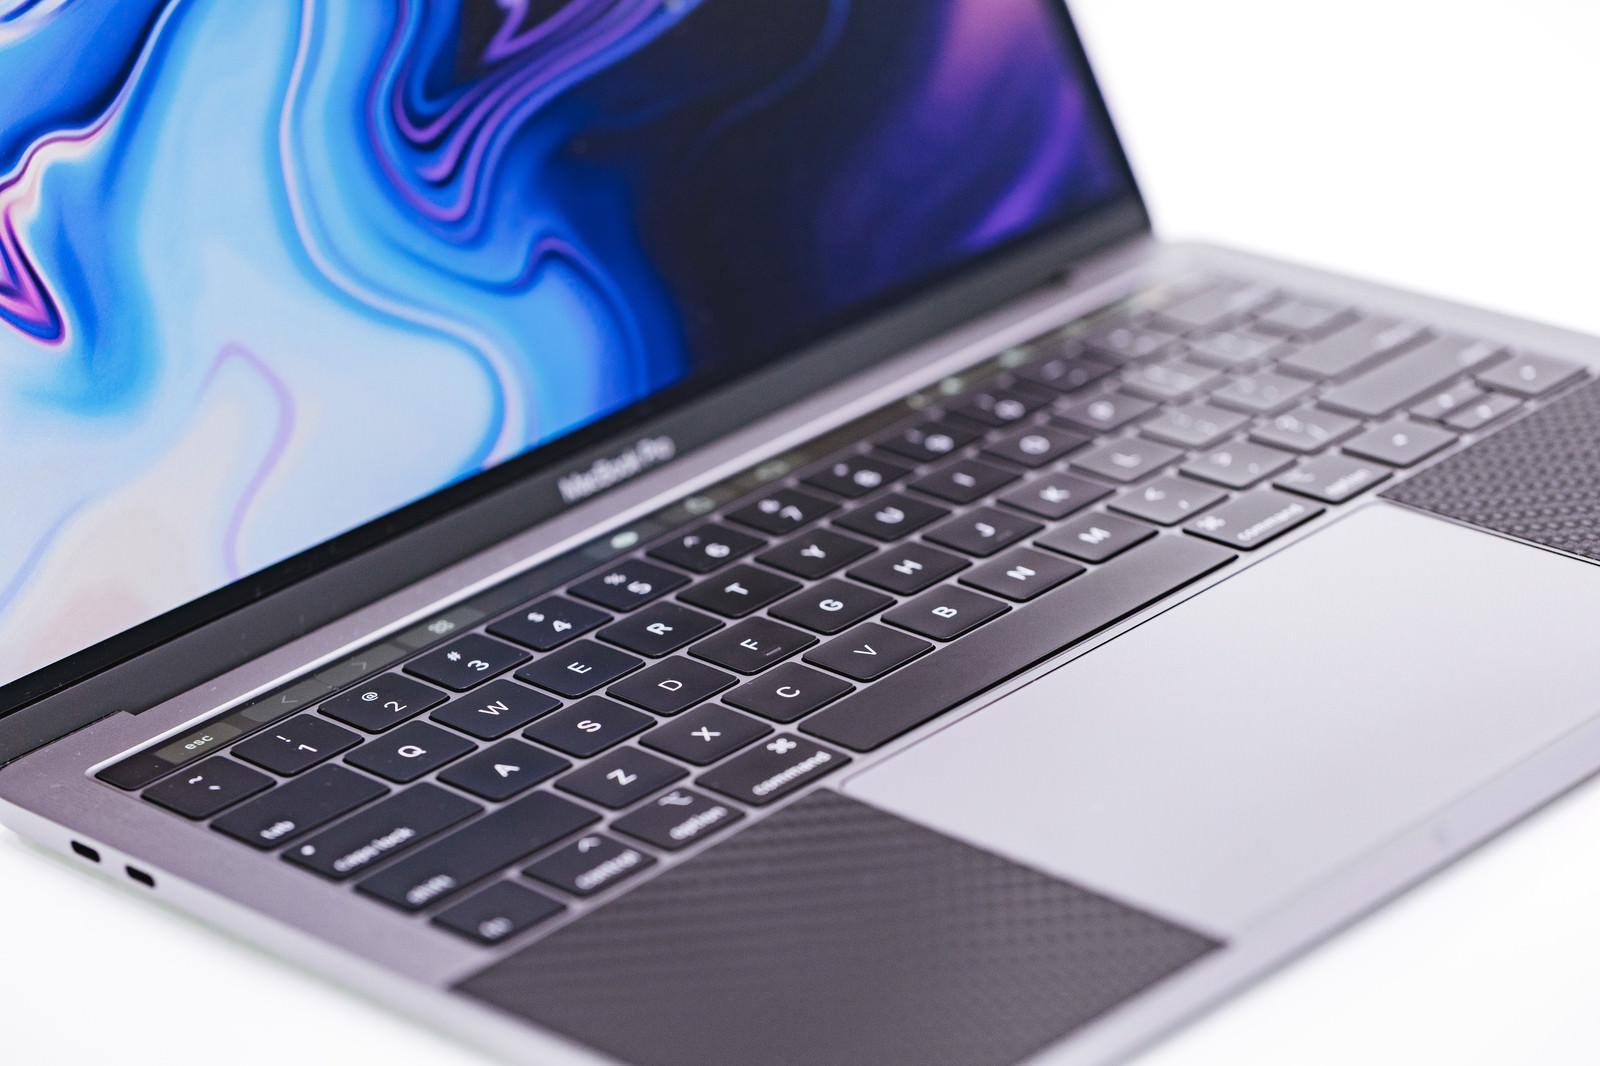 「MacBook Pro 2018 キーボード」の写真